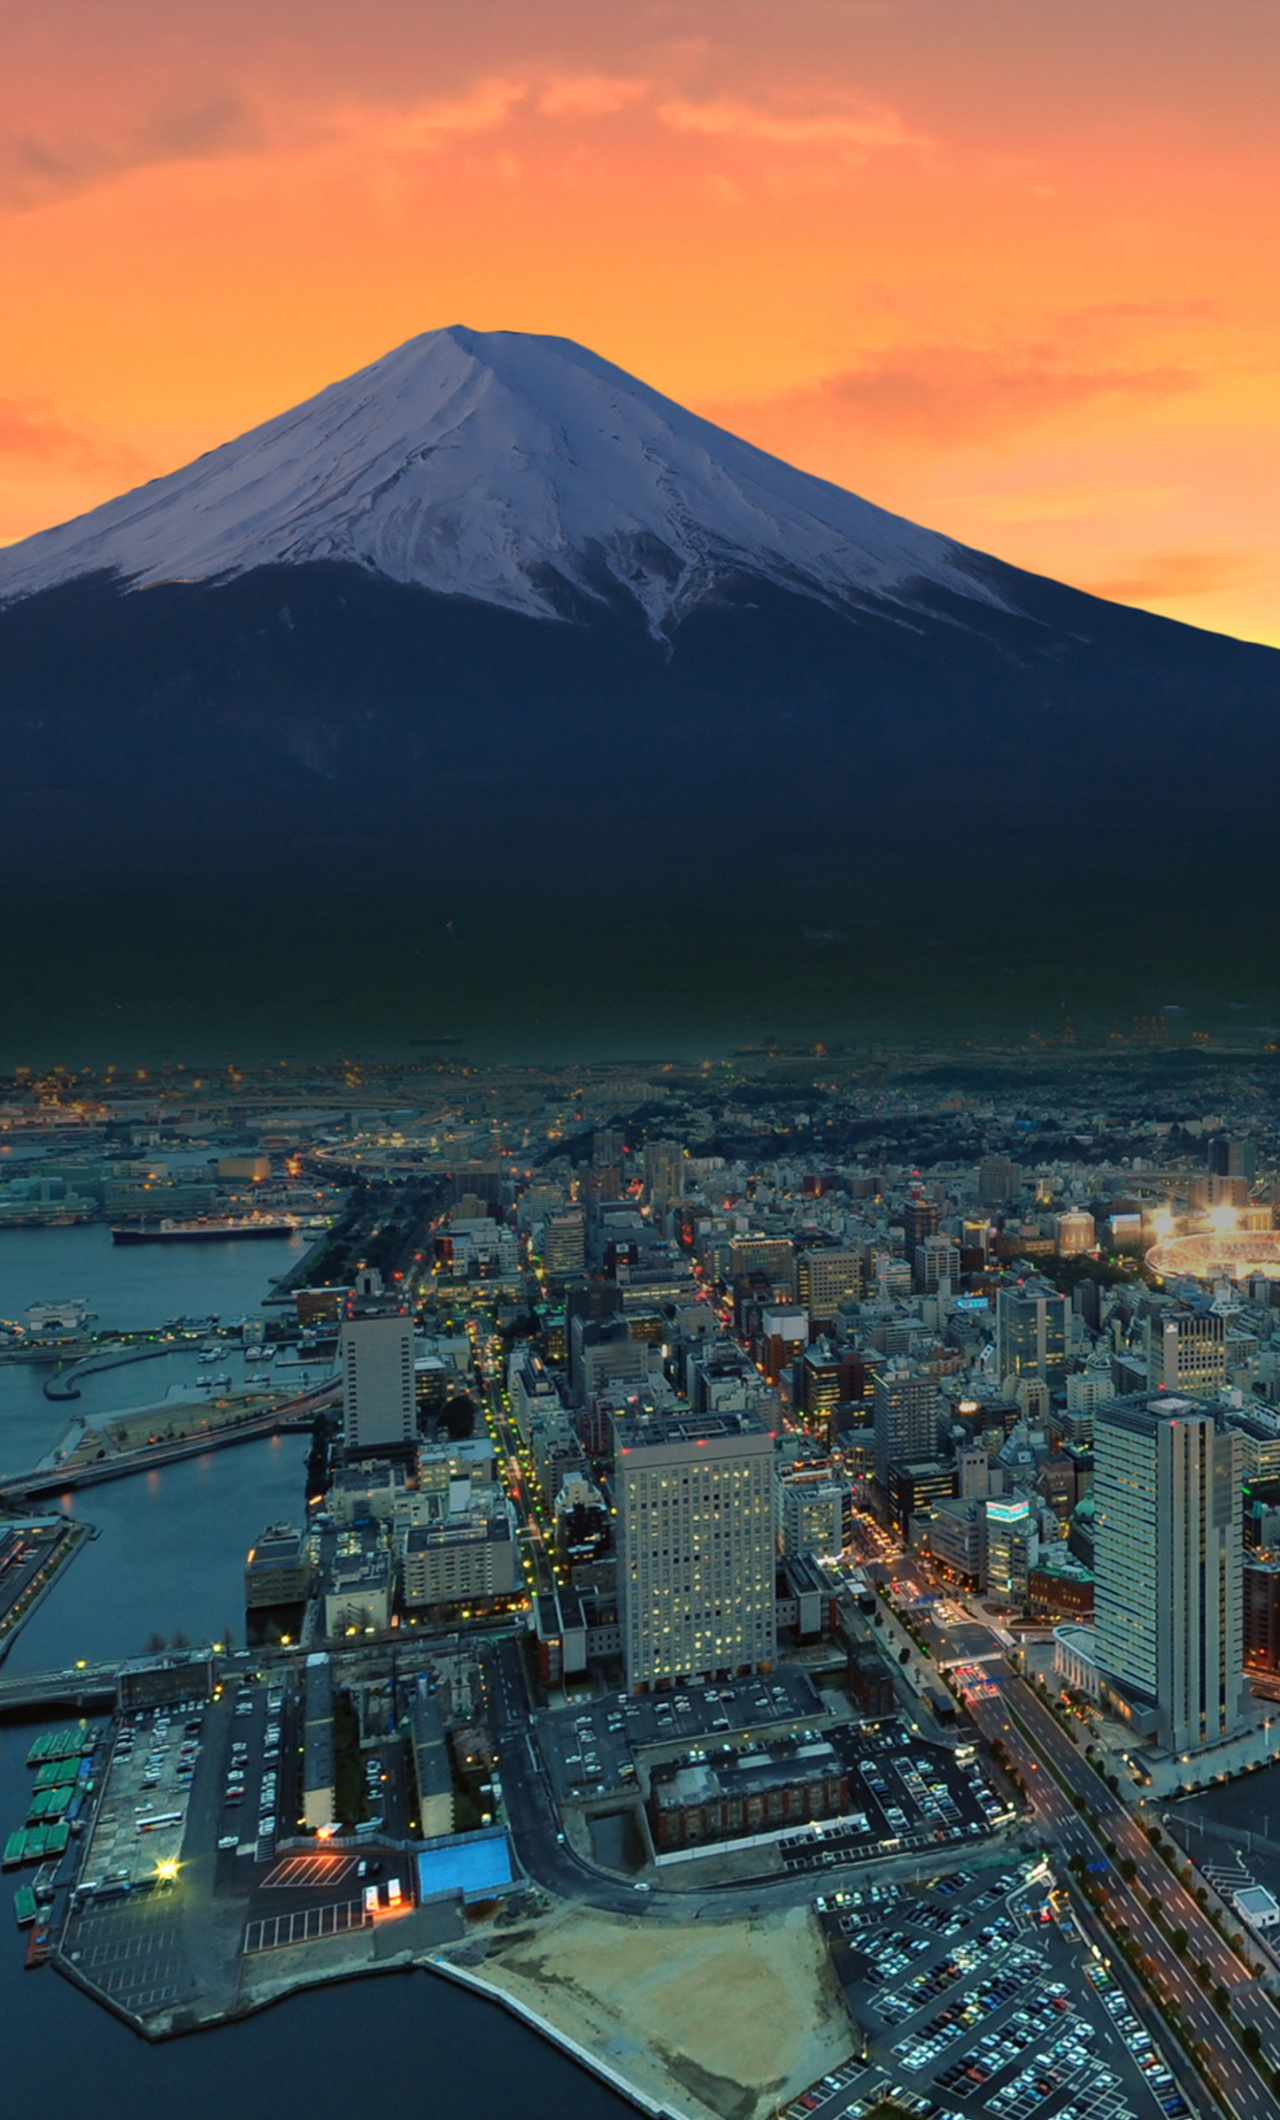 Mount Fuji Snowy Peak Japan Sunset City Ia